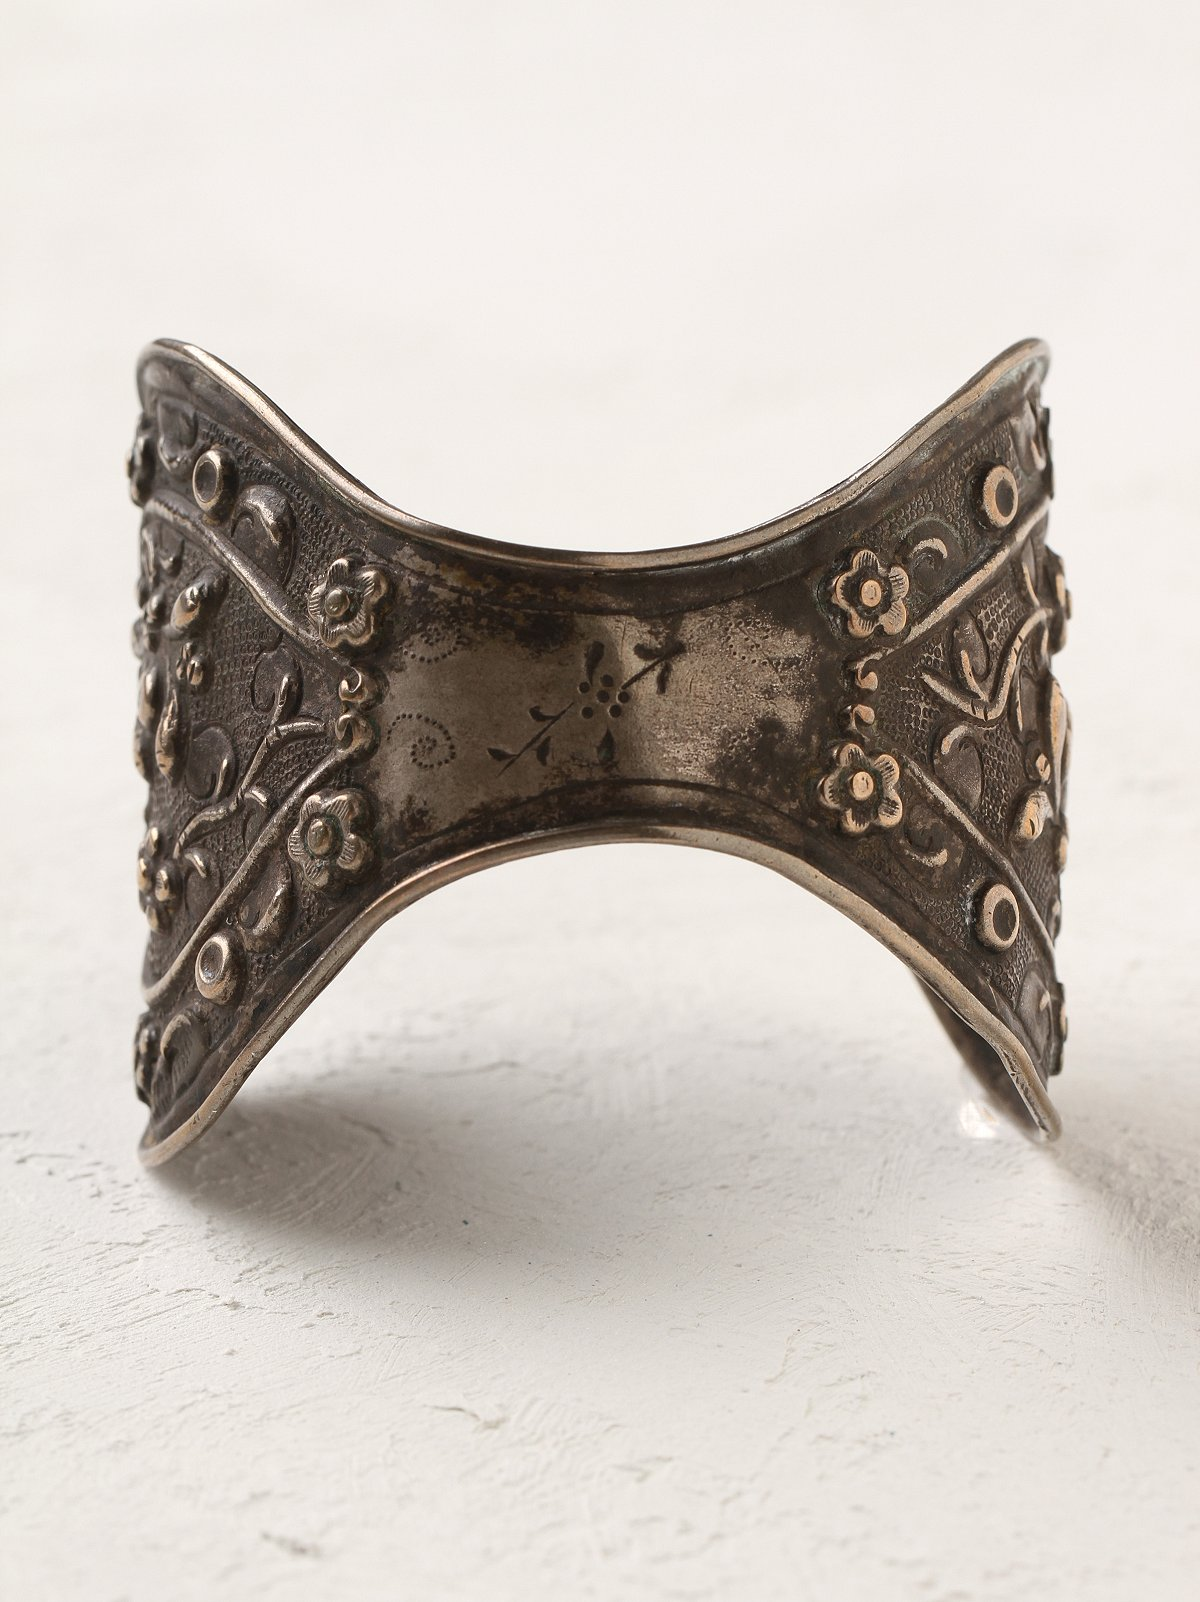 Vintage Silver Cuff